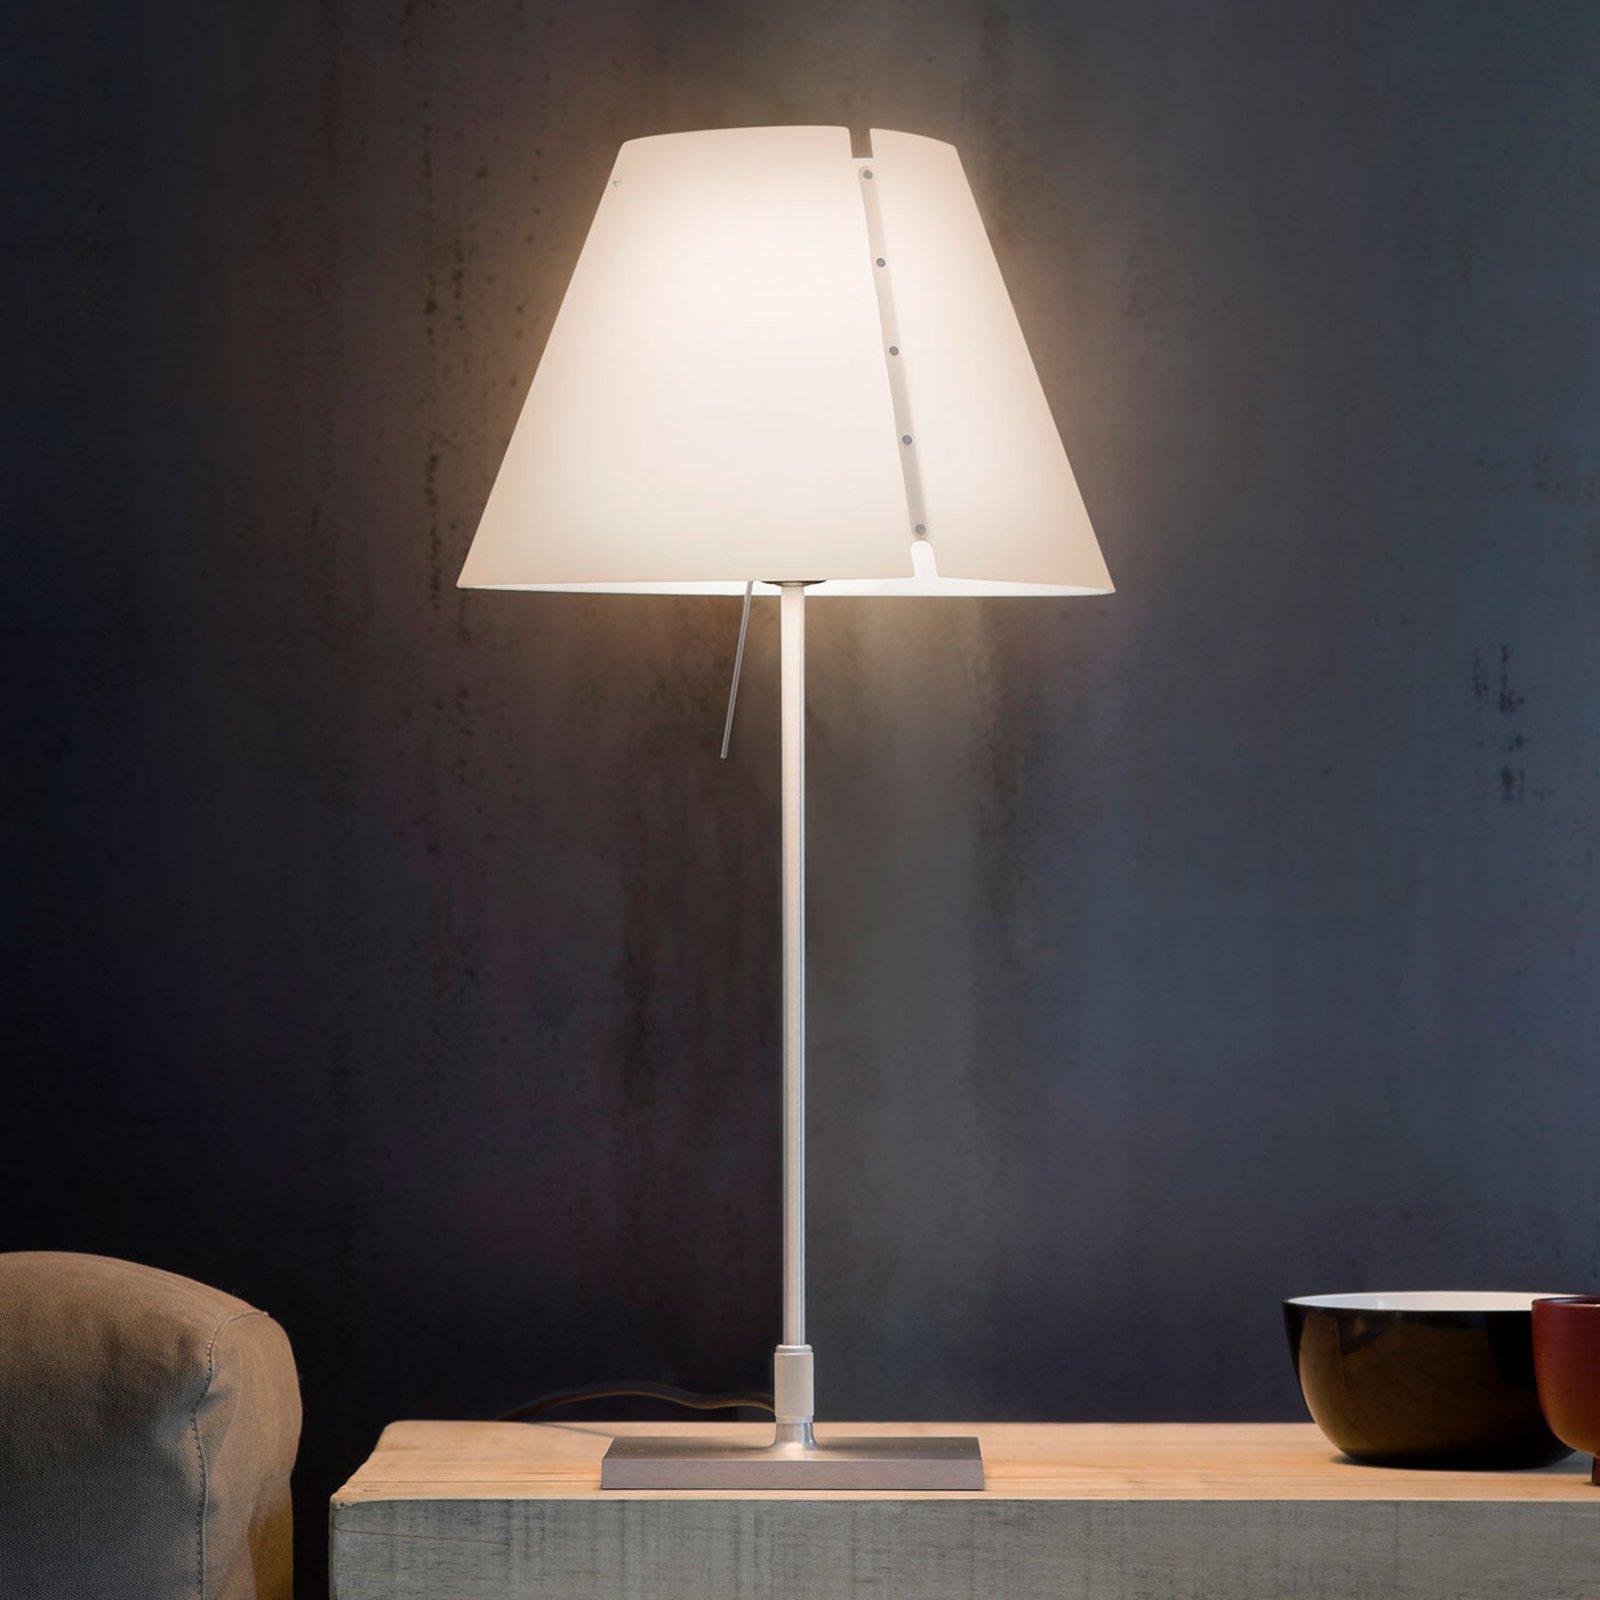 Luceplan Costanzina bordlampe alu, hvit